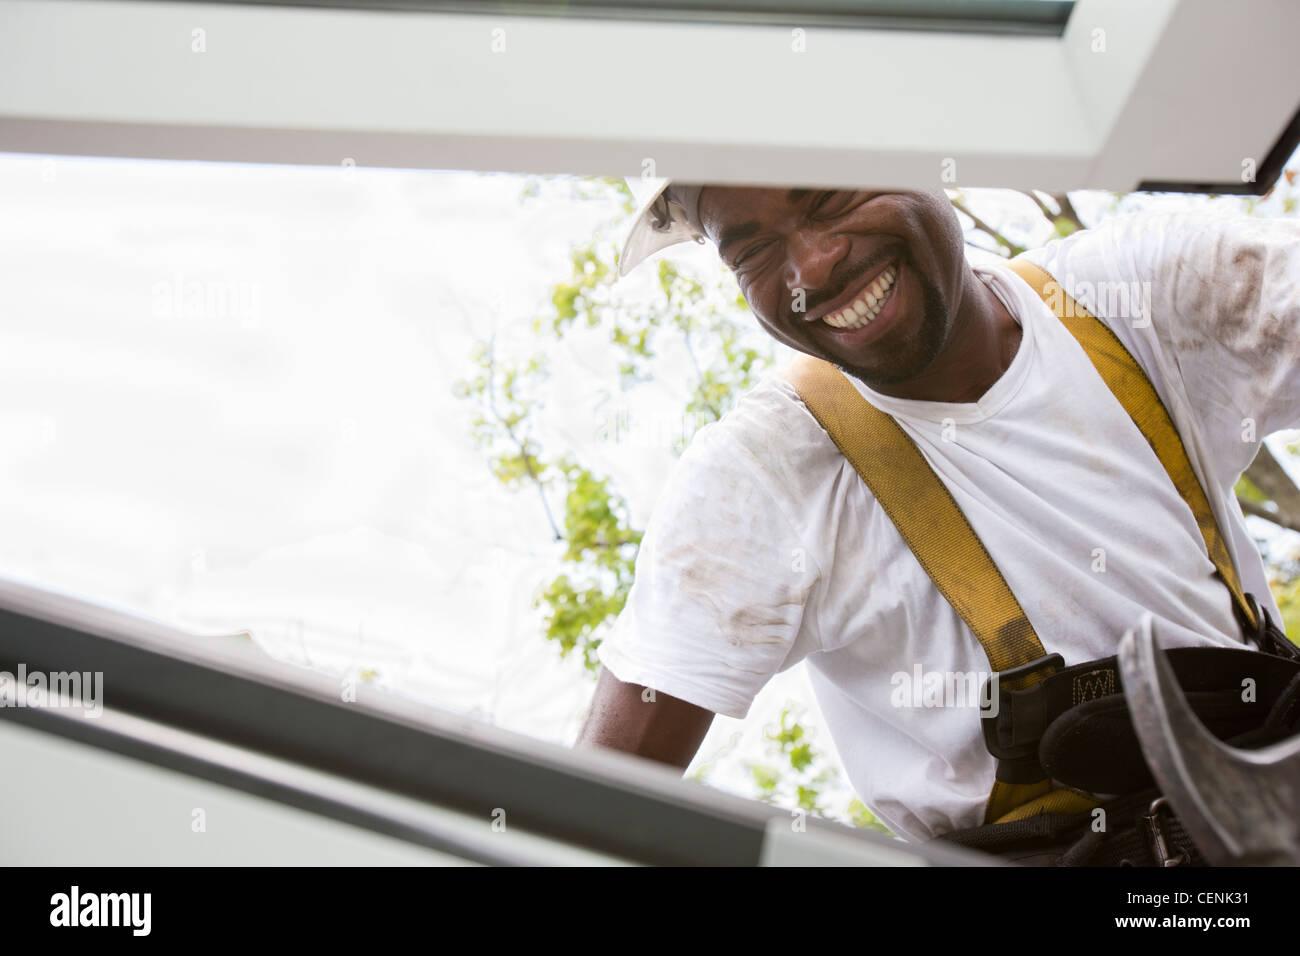 Carpenter inspecting installation of skylight window - Stock Image